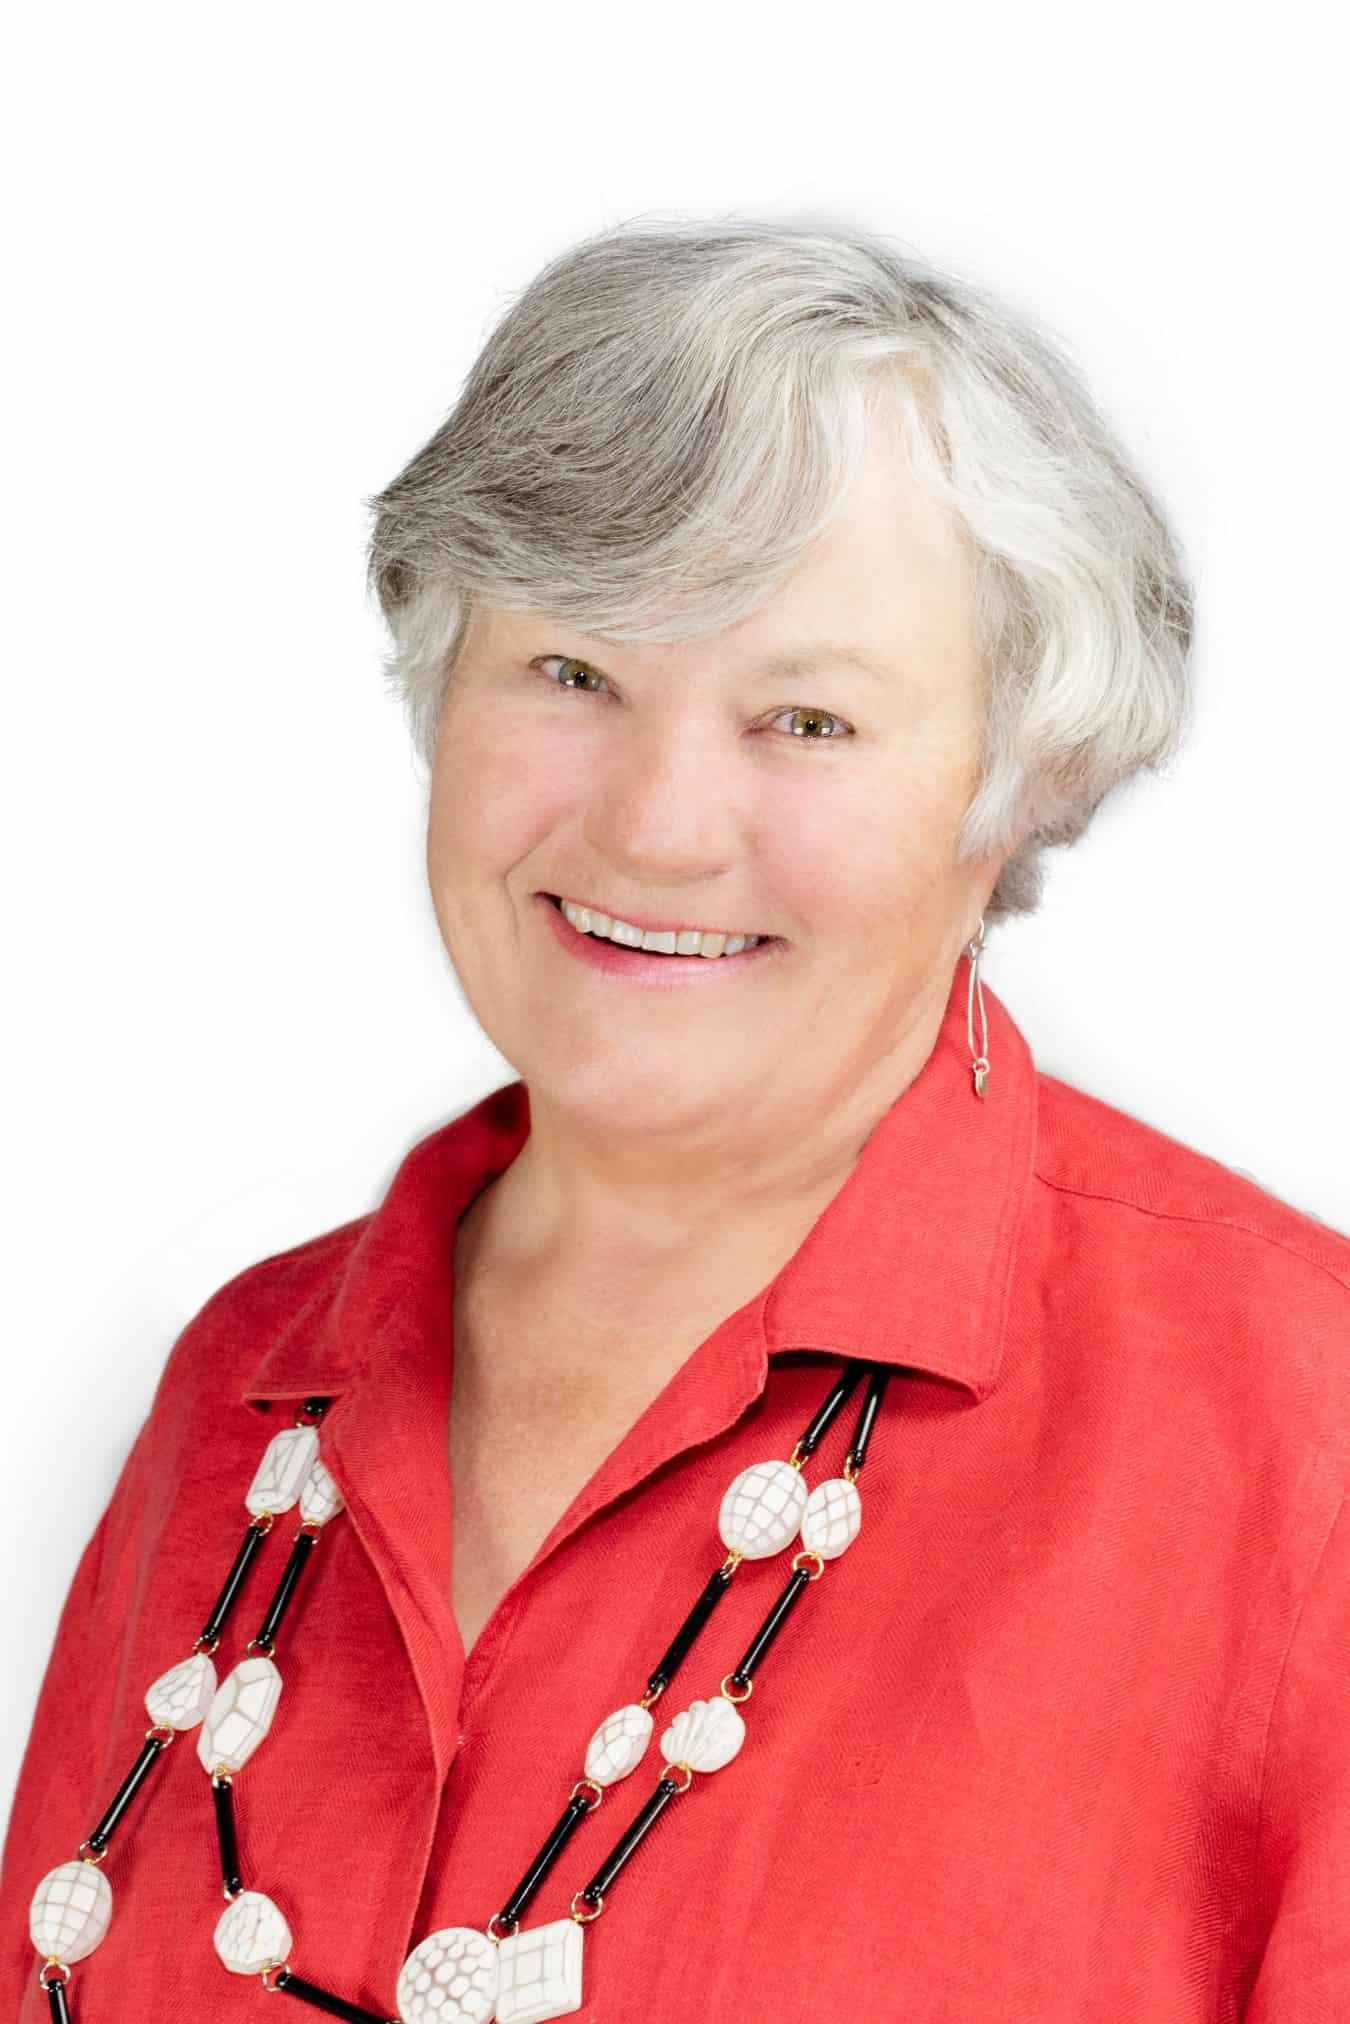 Marianne Ackerman